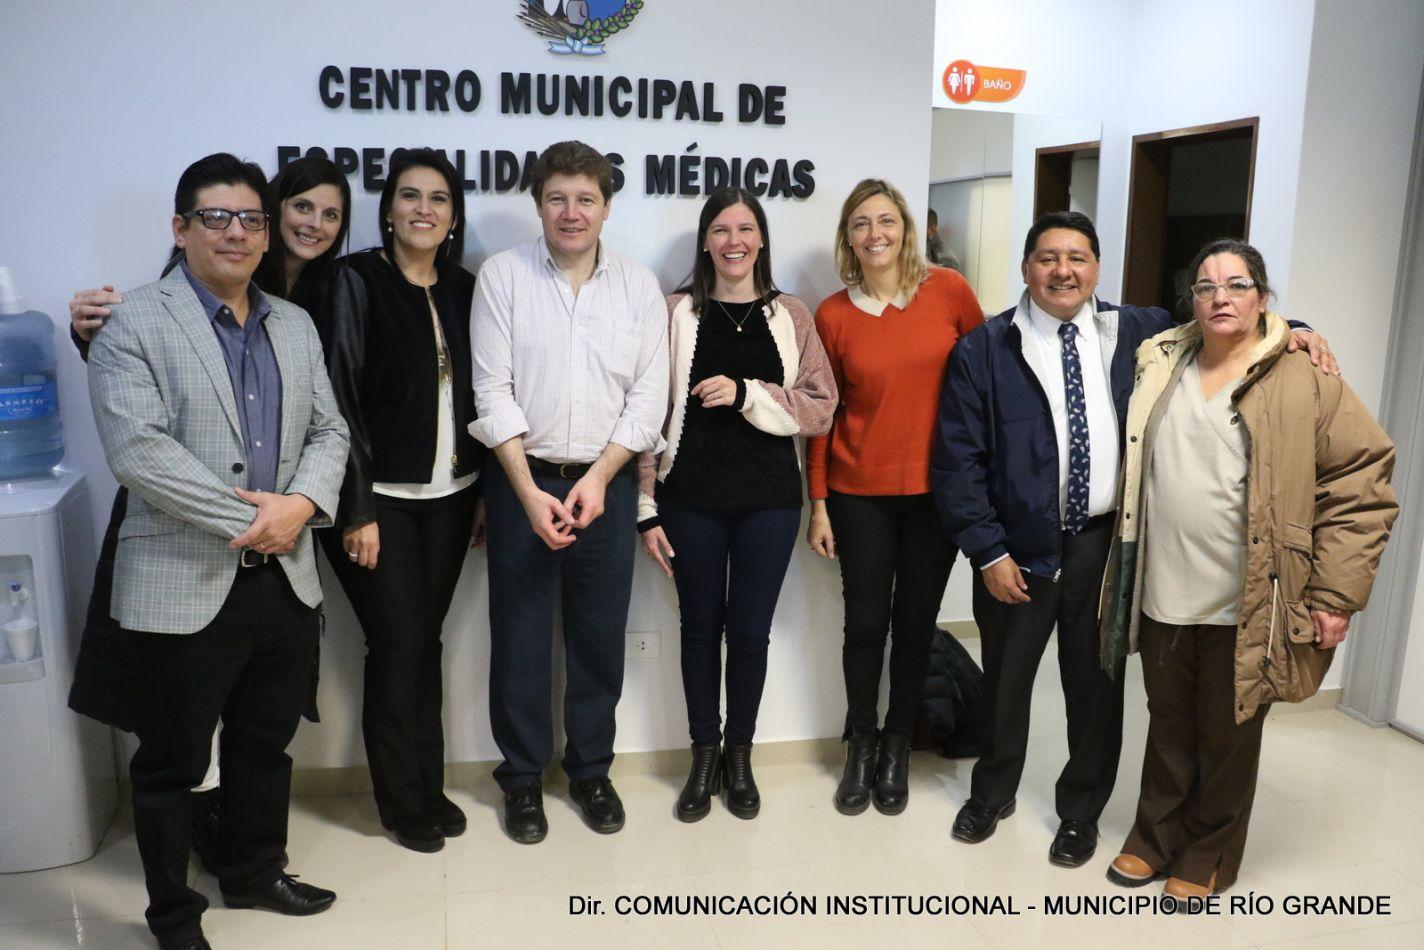 El Centro Municipal de Especialidades Médicas quedó inaugurado